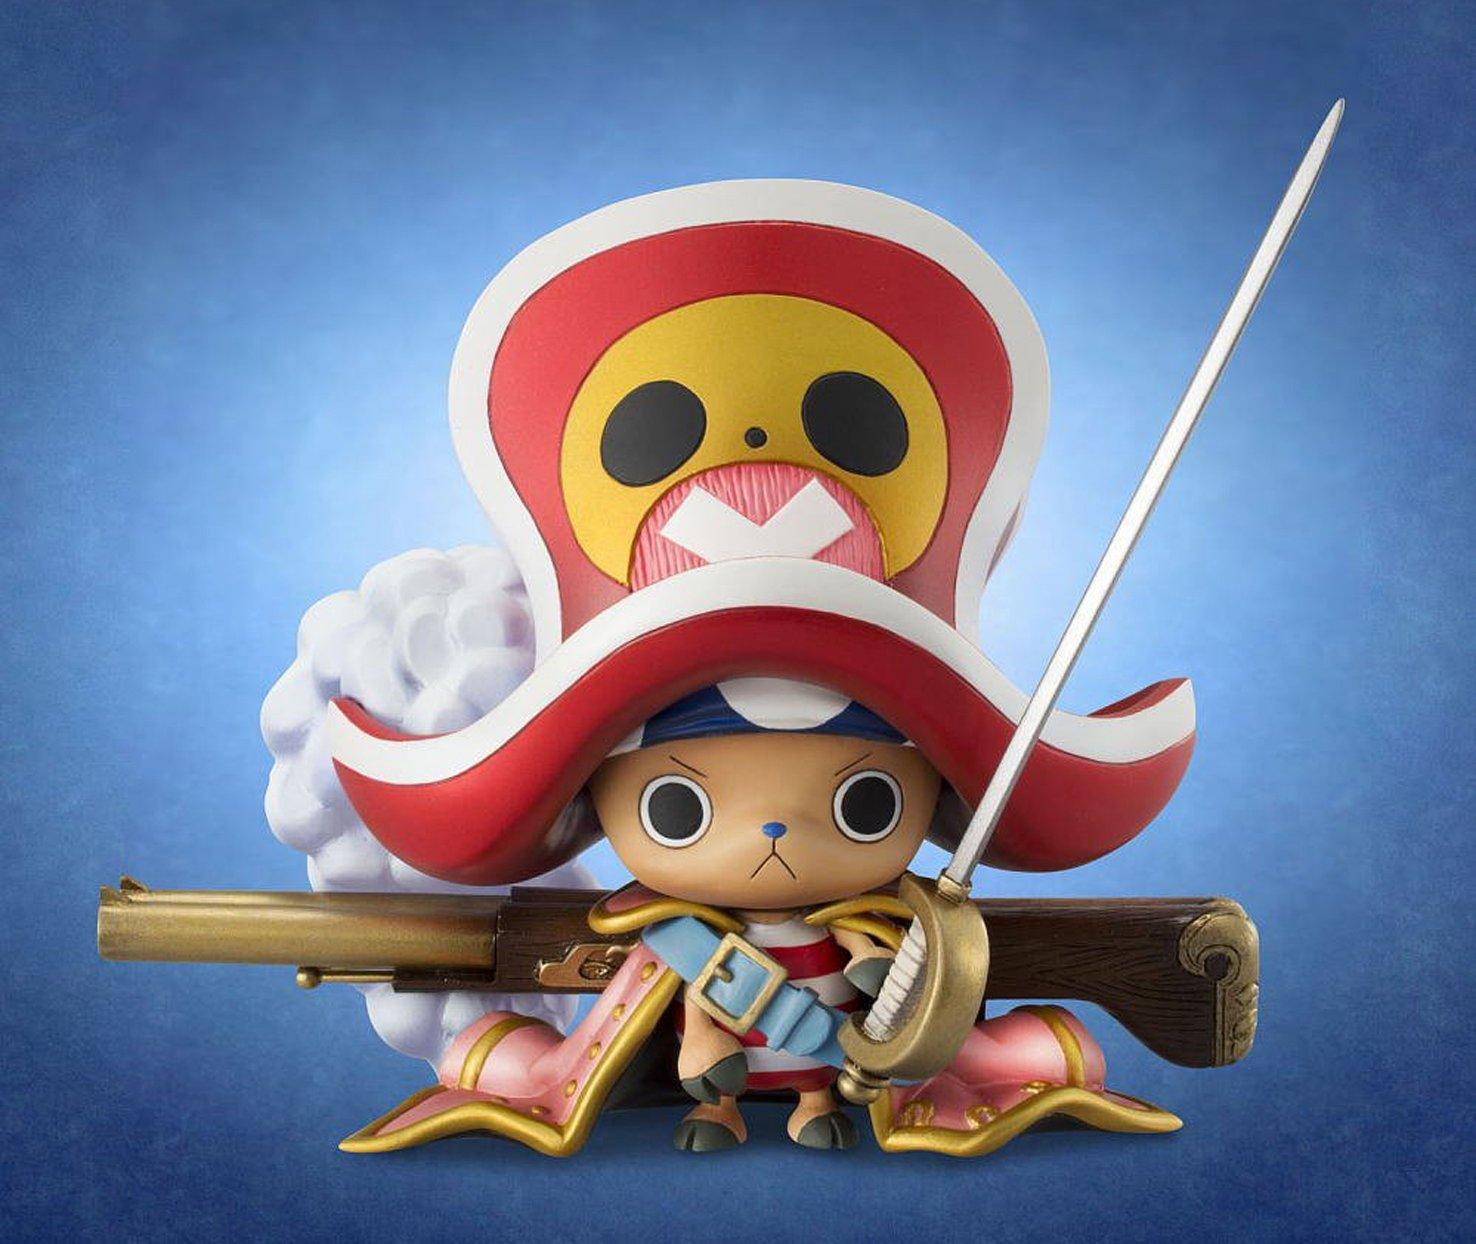 One Piece Chopper Wallpaper - WallpaperSafari